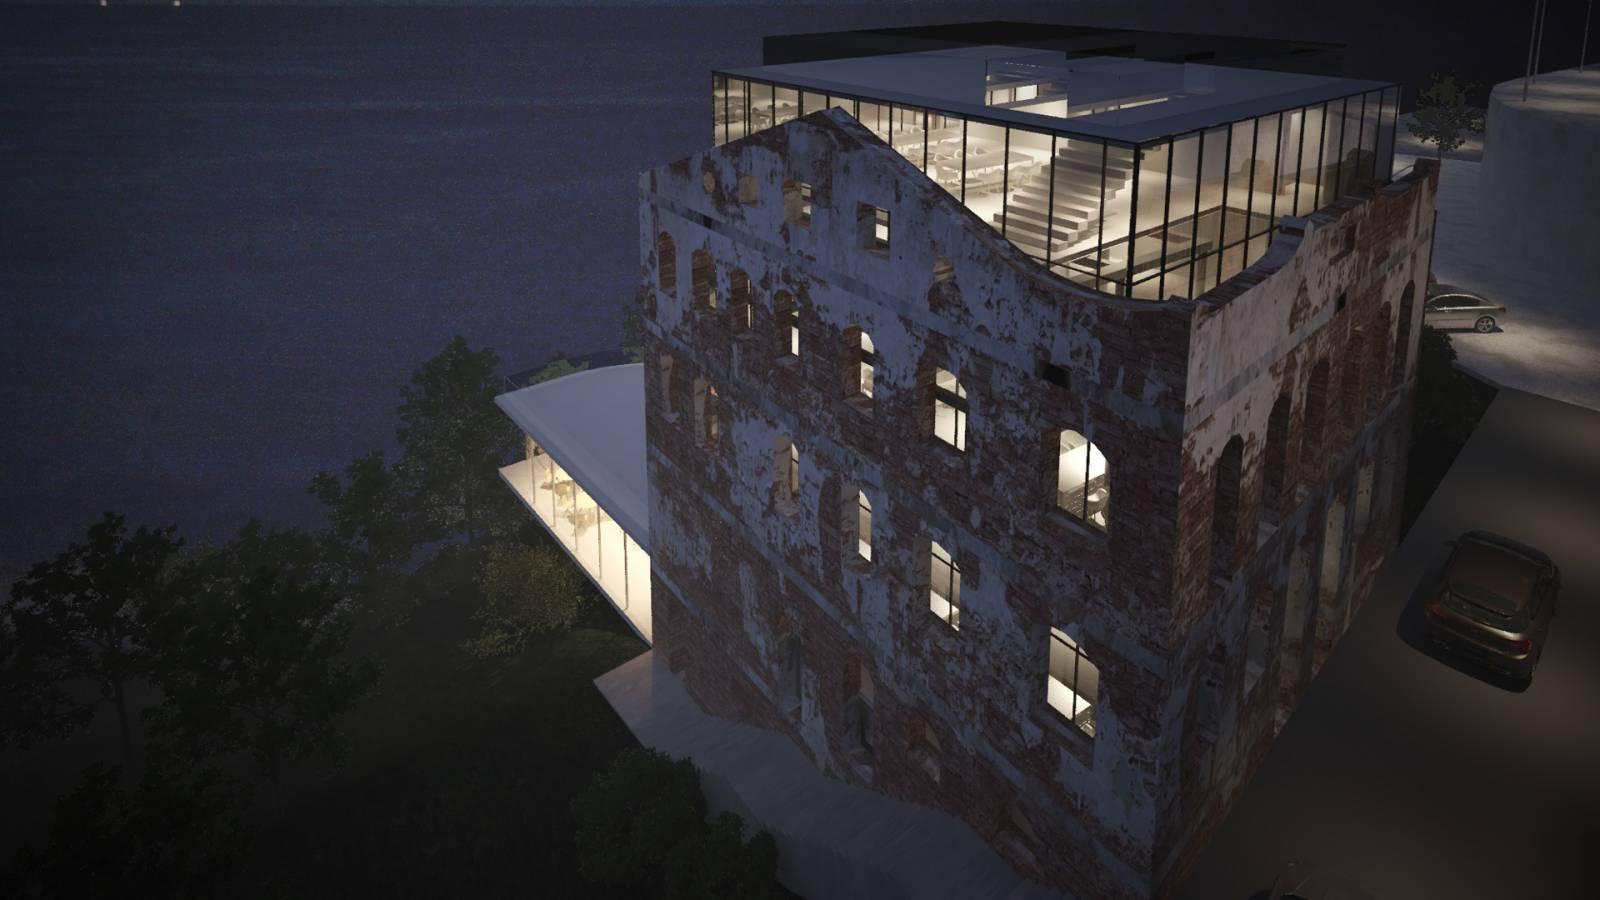 NIGHT VIEW - Sodré - SPOL Architects